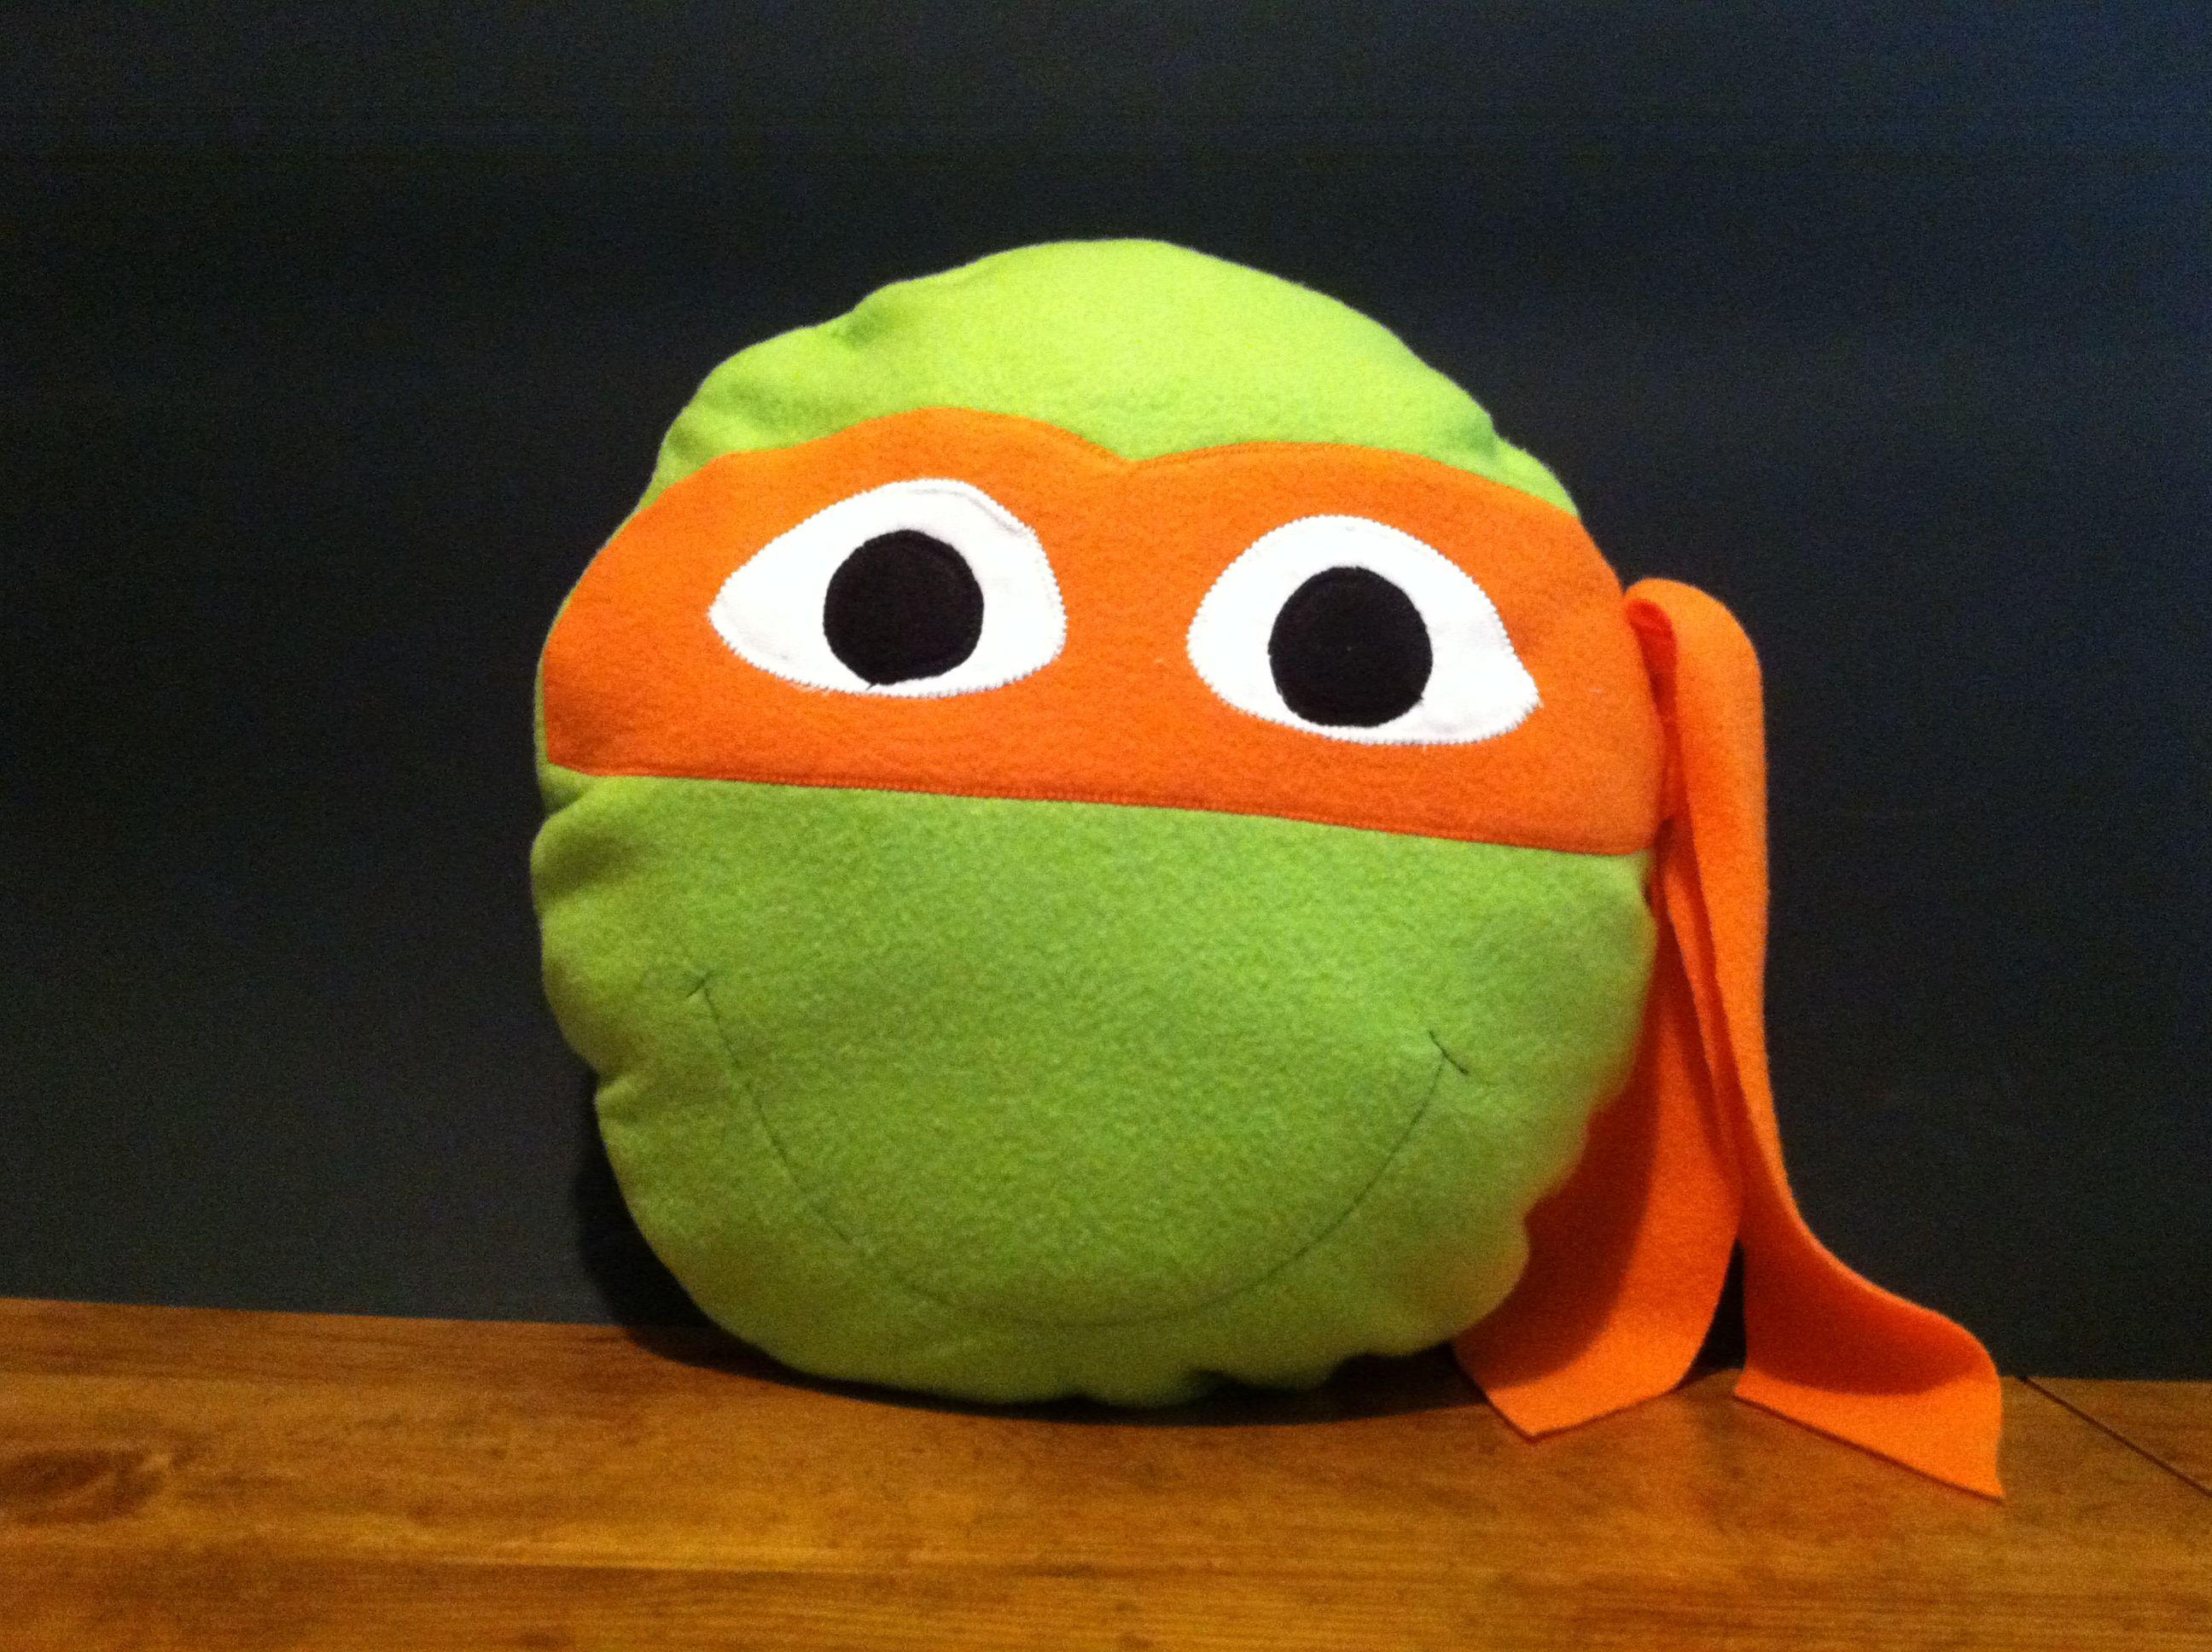 Ninja Turtle Decorative Pillow : Ninja Turtle Pillow Sewing Pinterest Ninja turtles, Turtle and Pillows